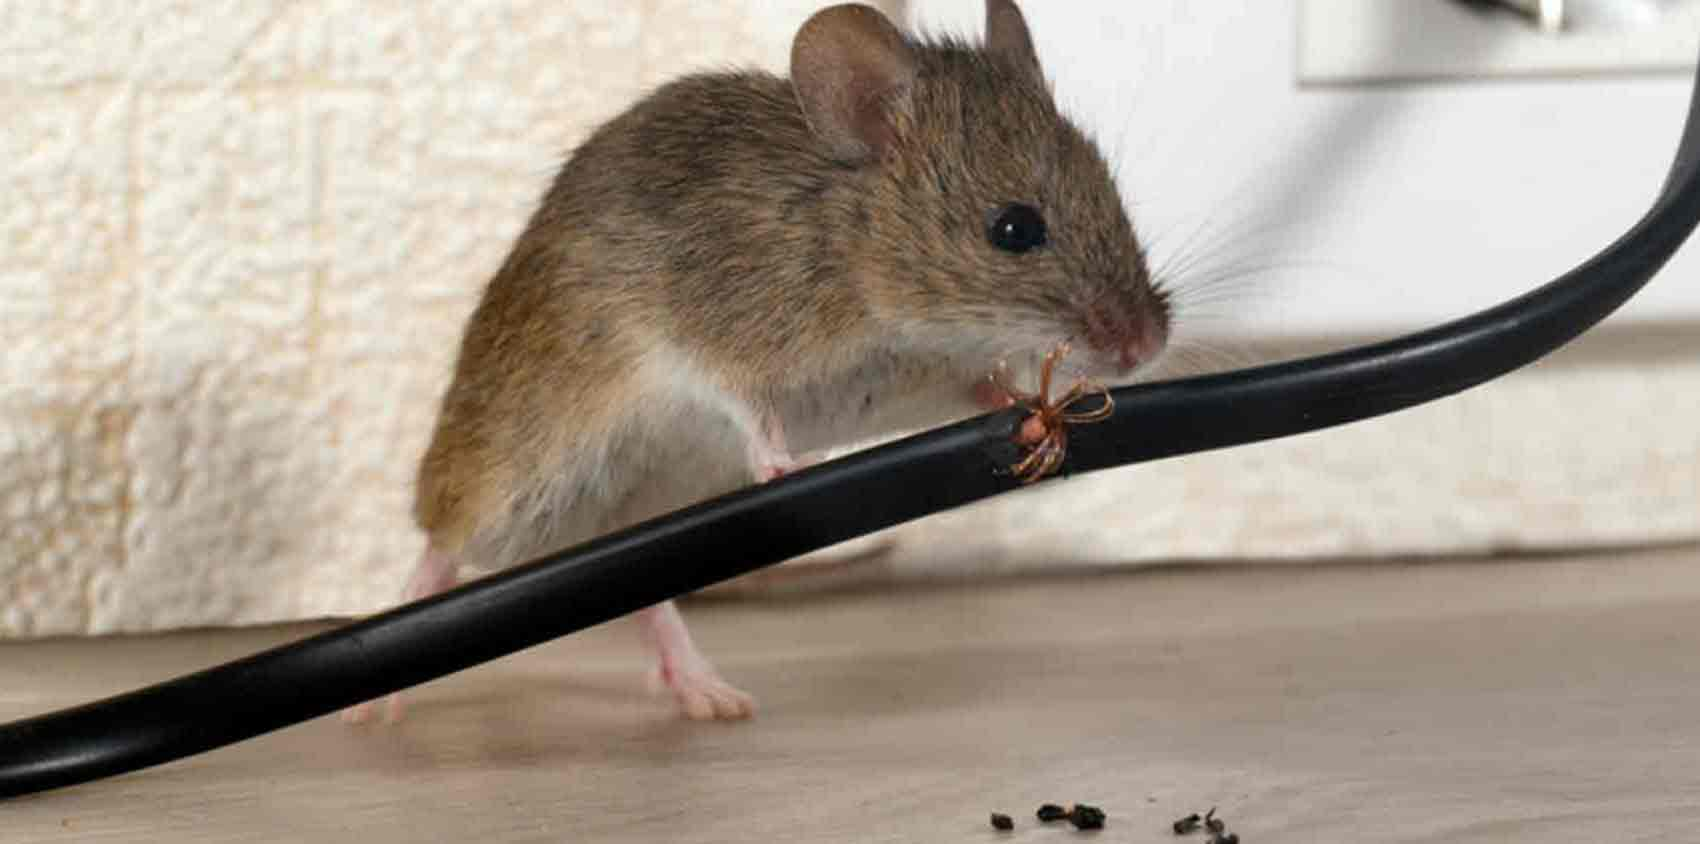 pest-control-copmany-near-me-pest-damage